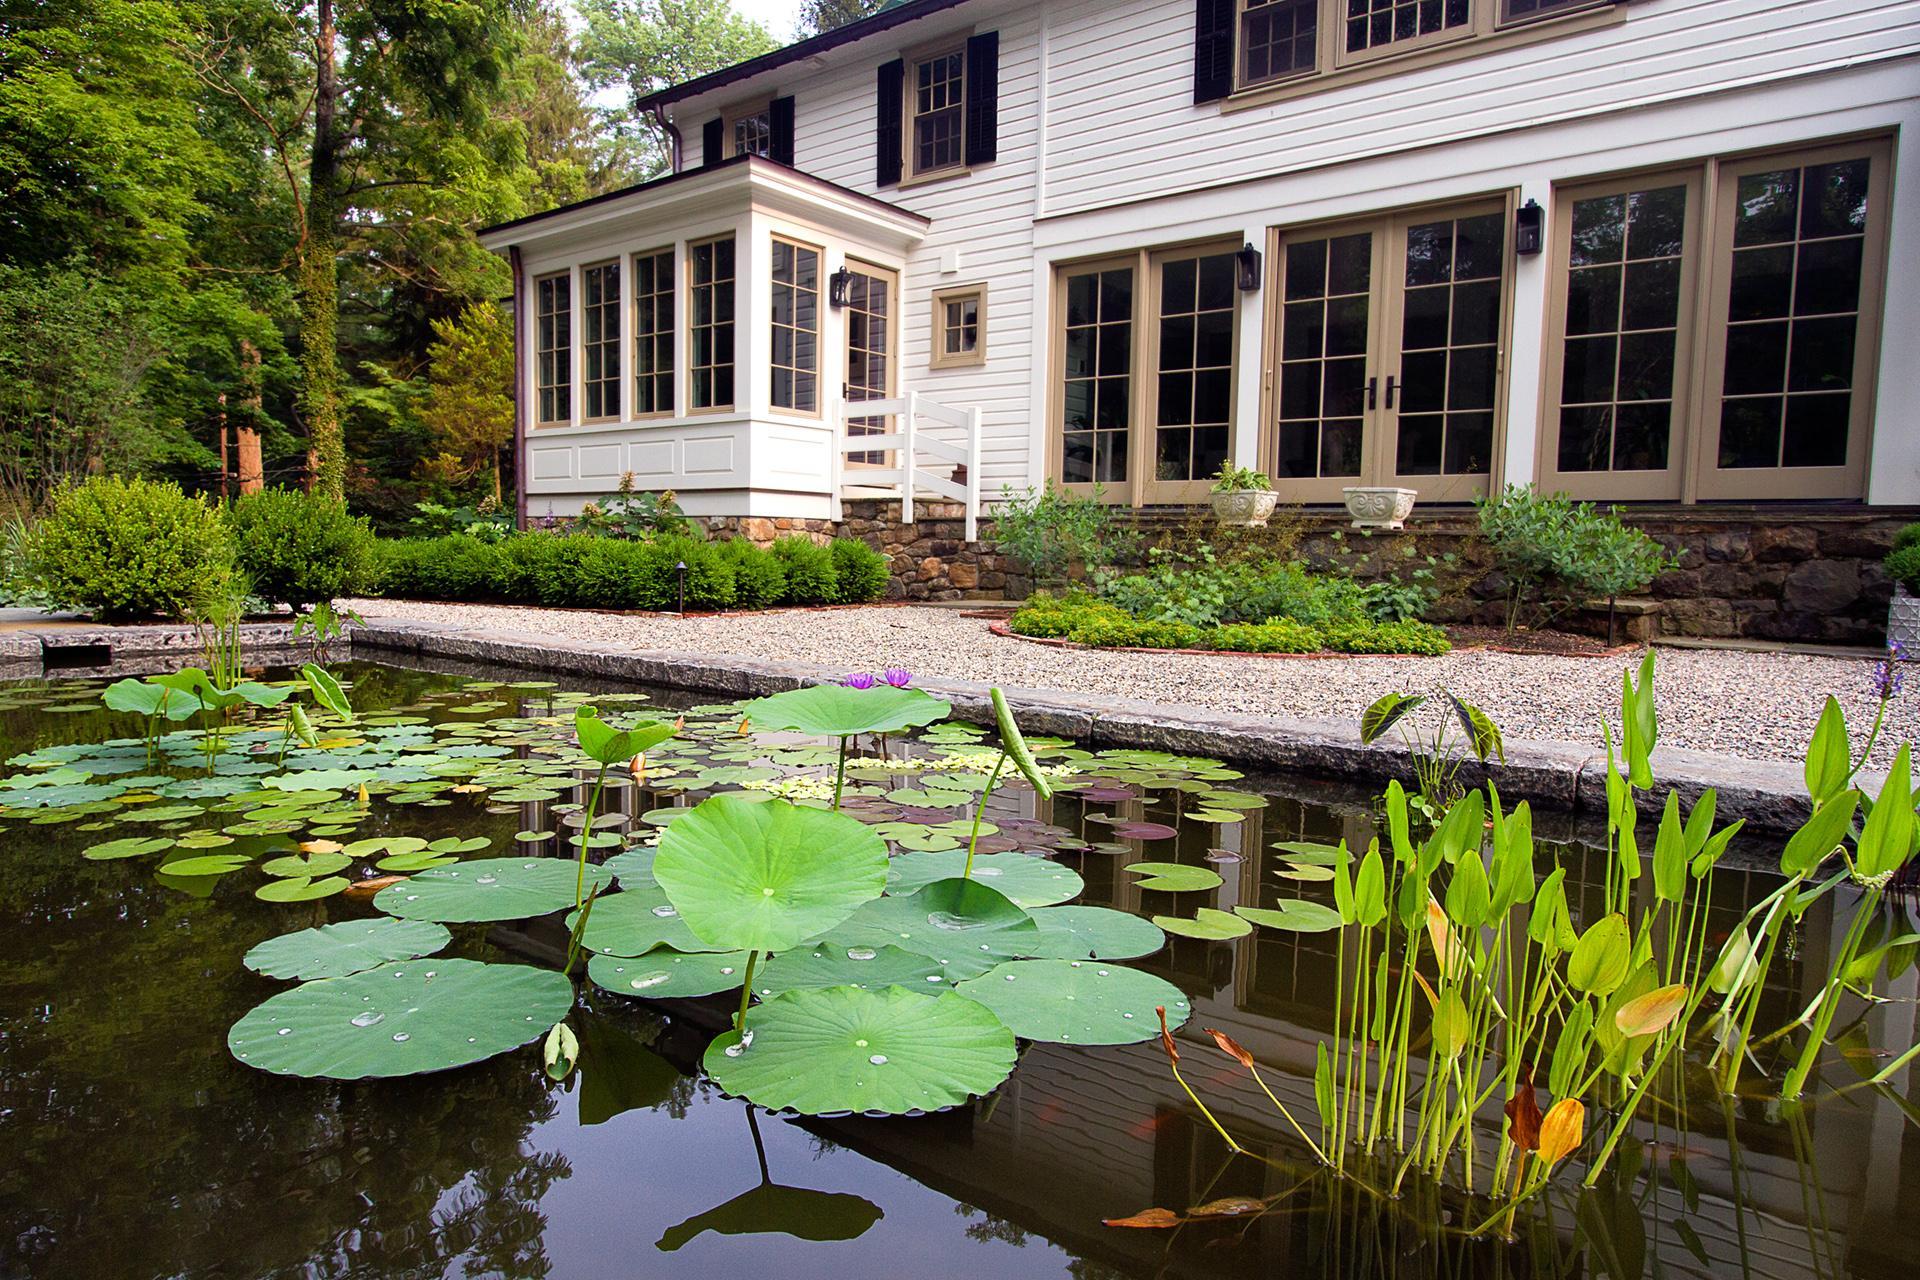 lily-pond-koi-pond-design-main-line-garden-landscape